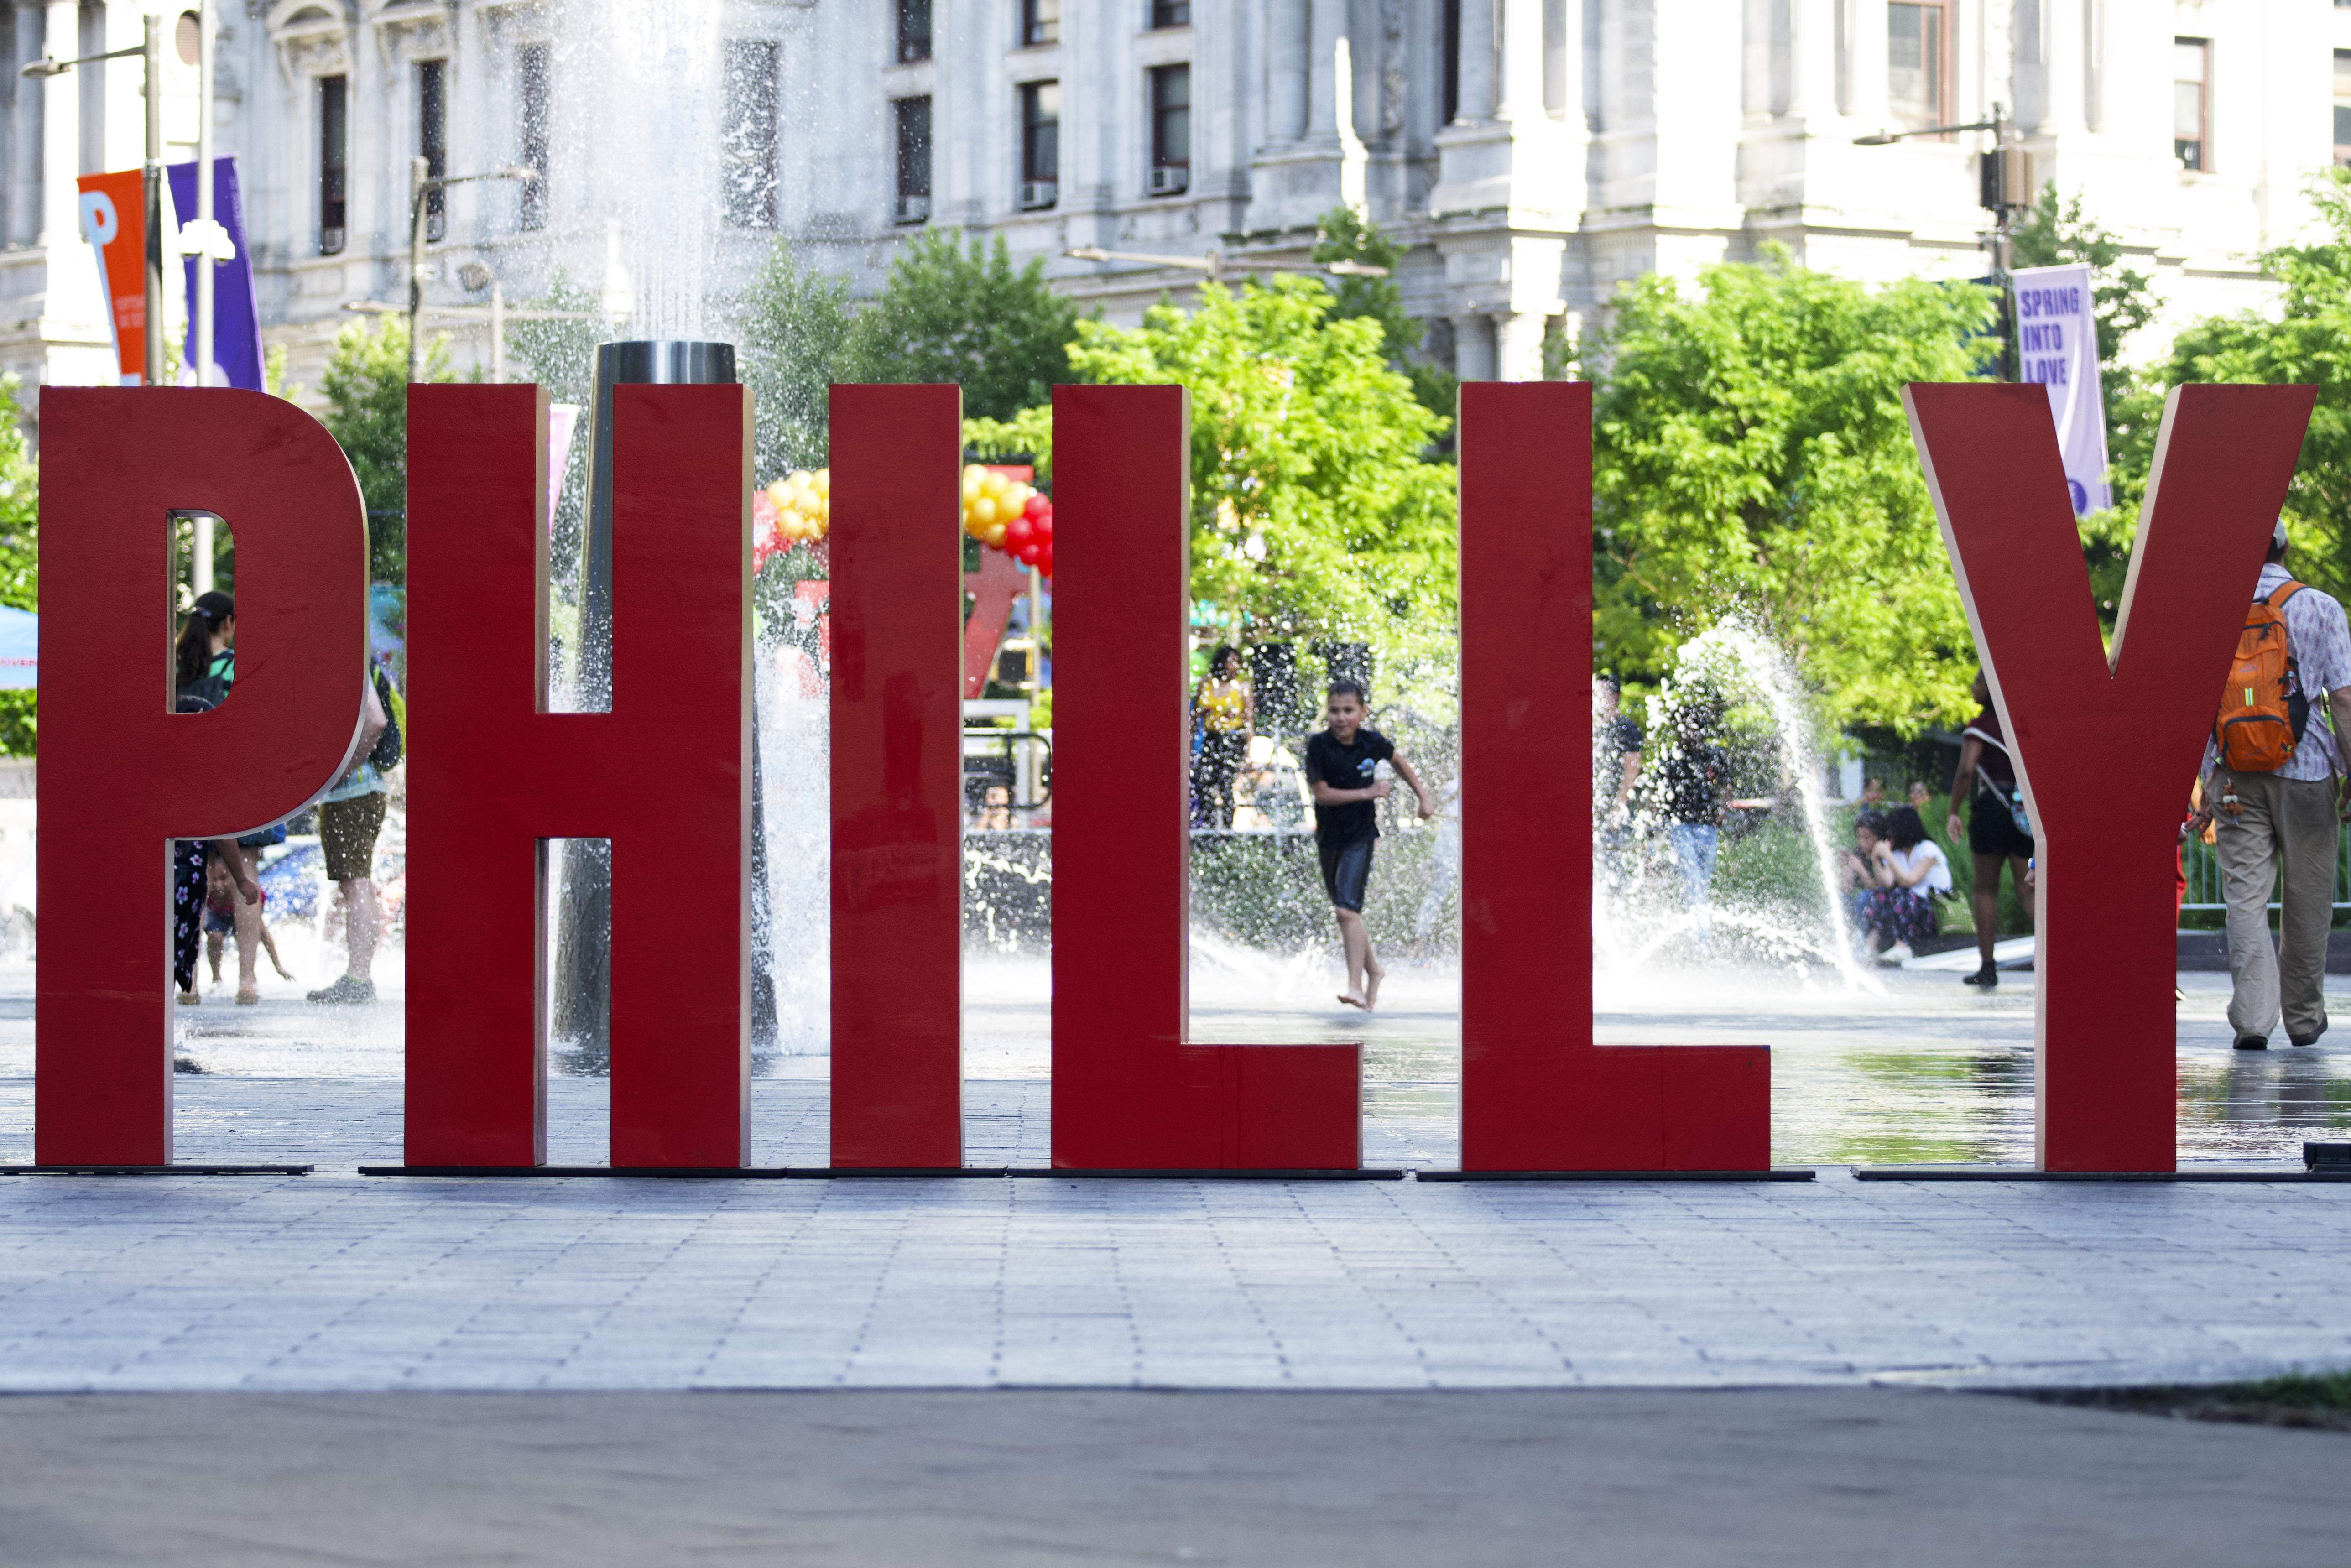 Daily Life in Center City Philadelphia